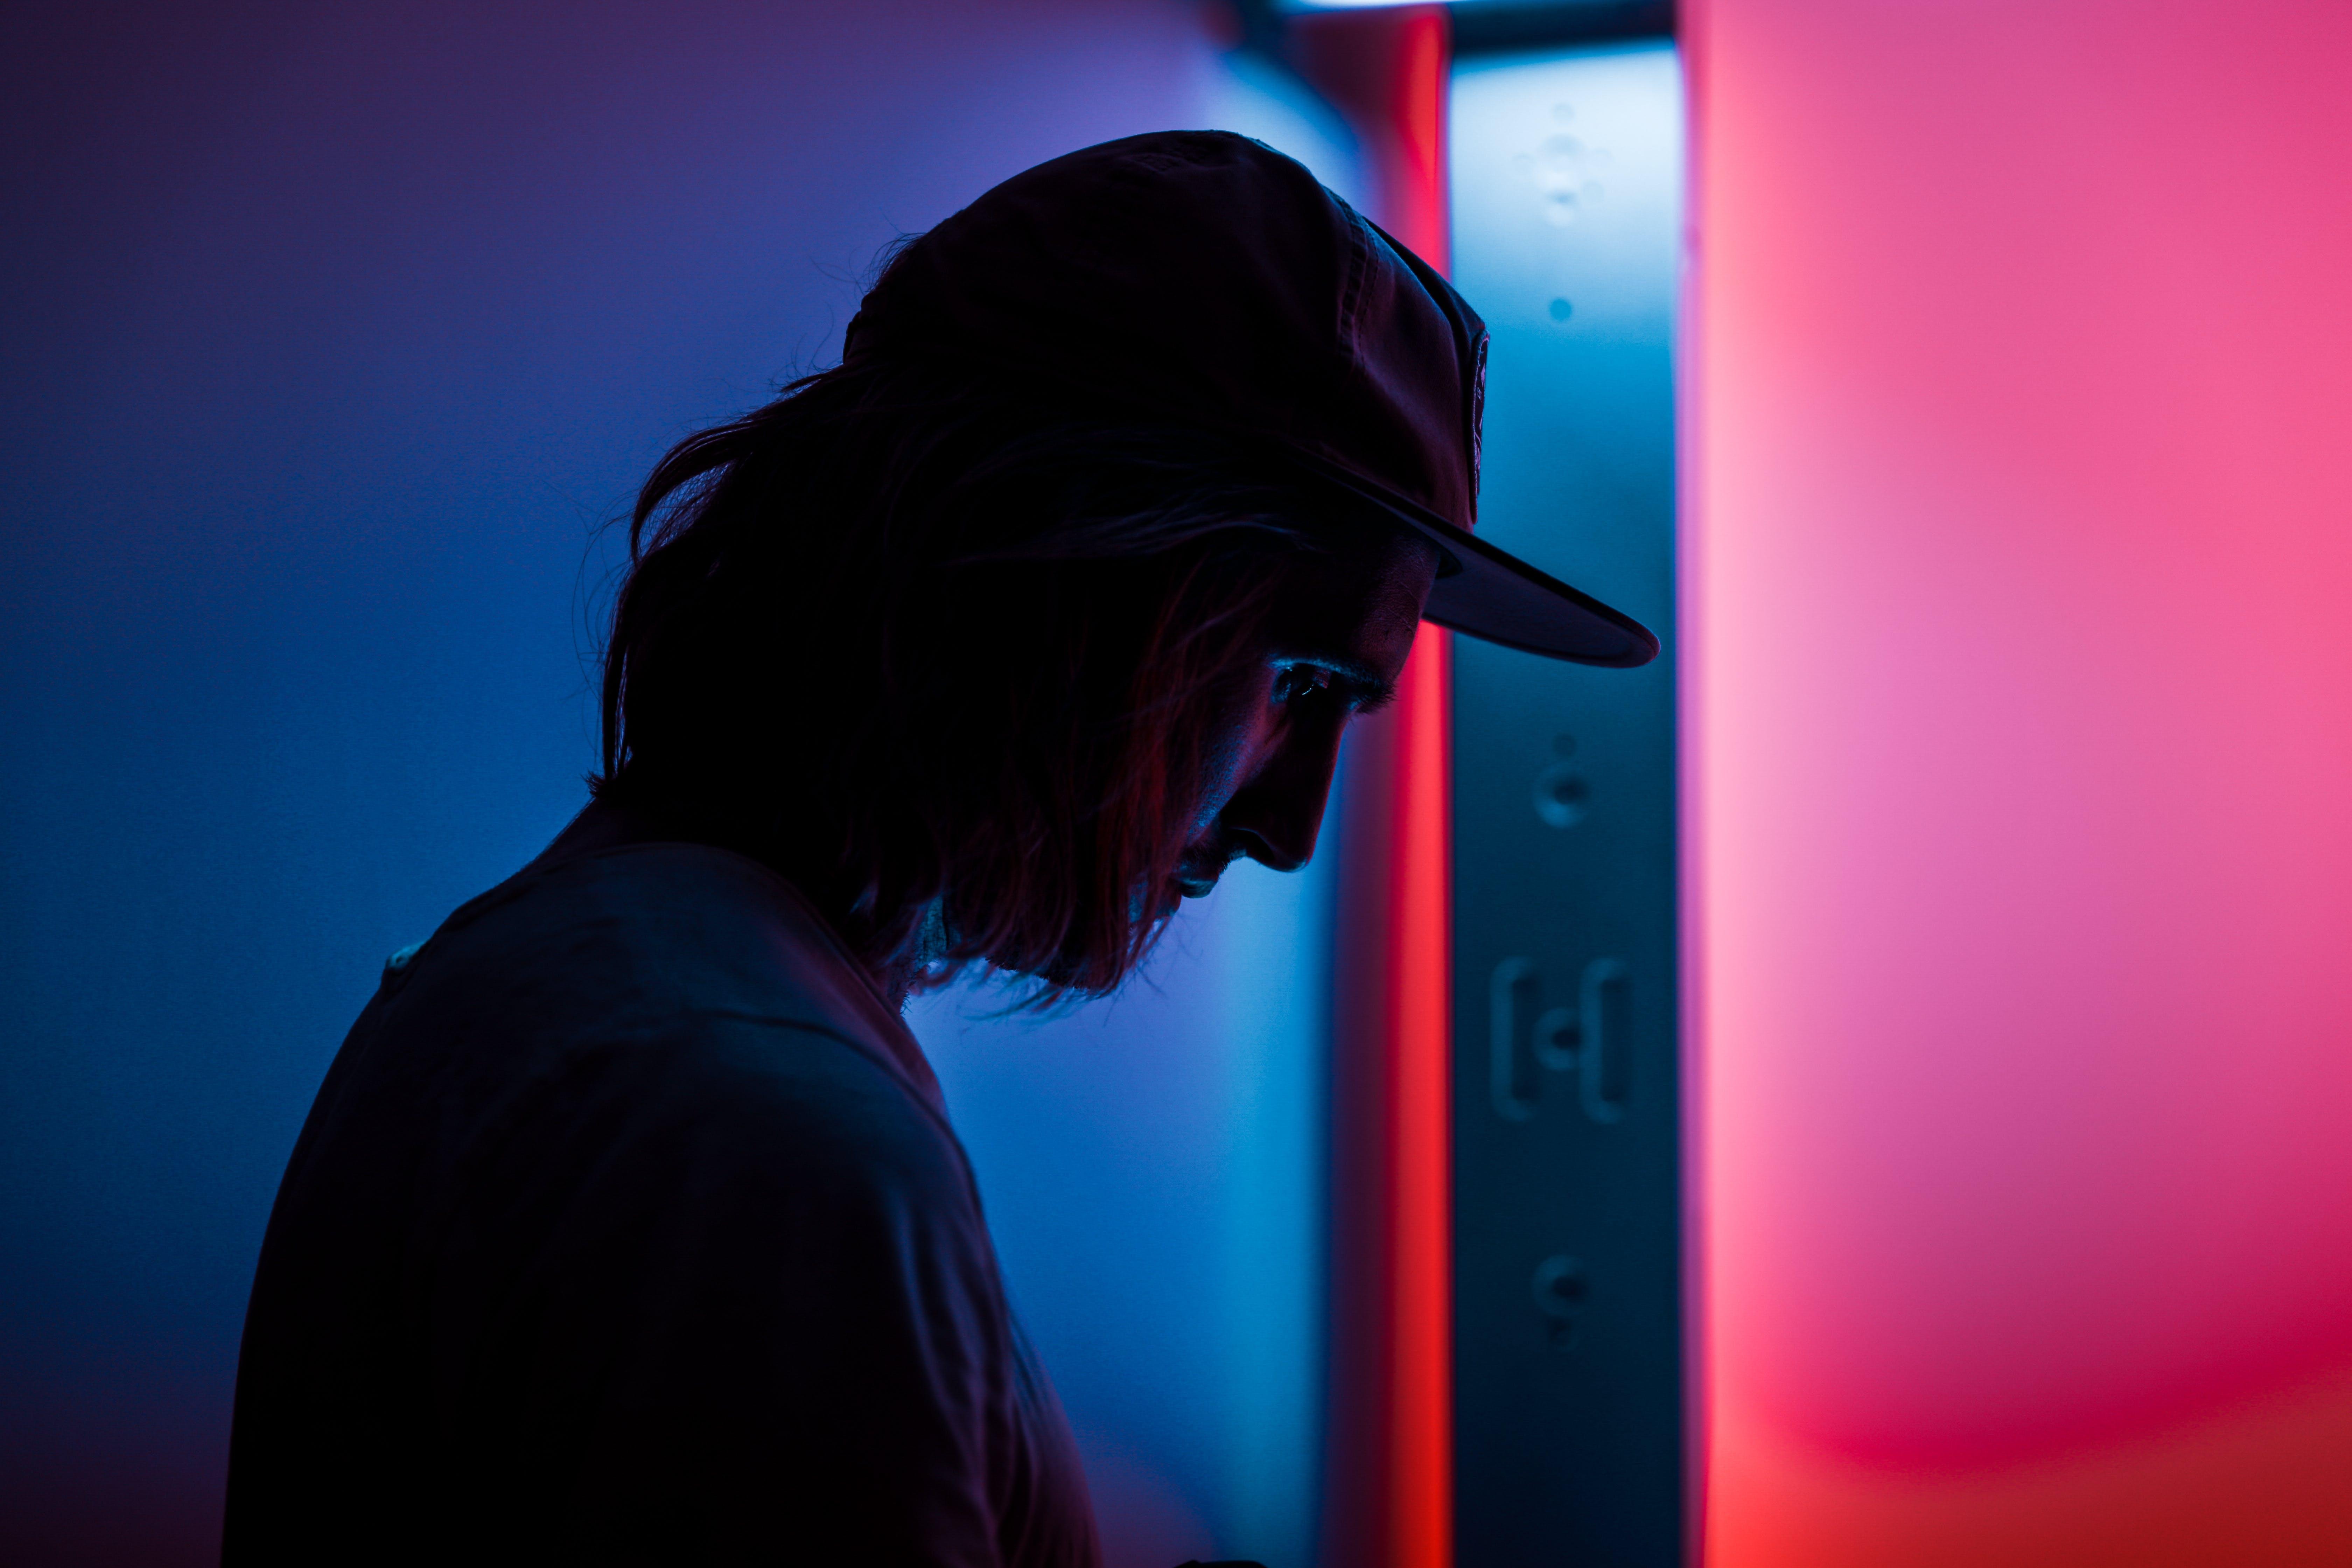 Silhouette of Man Wearing Fitted Cap Near Door